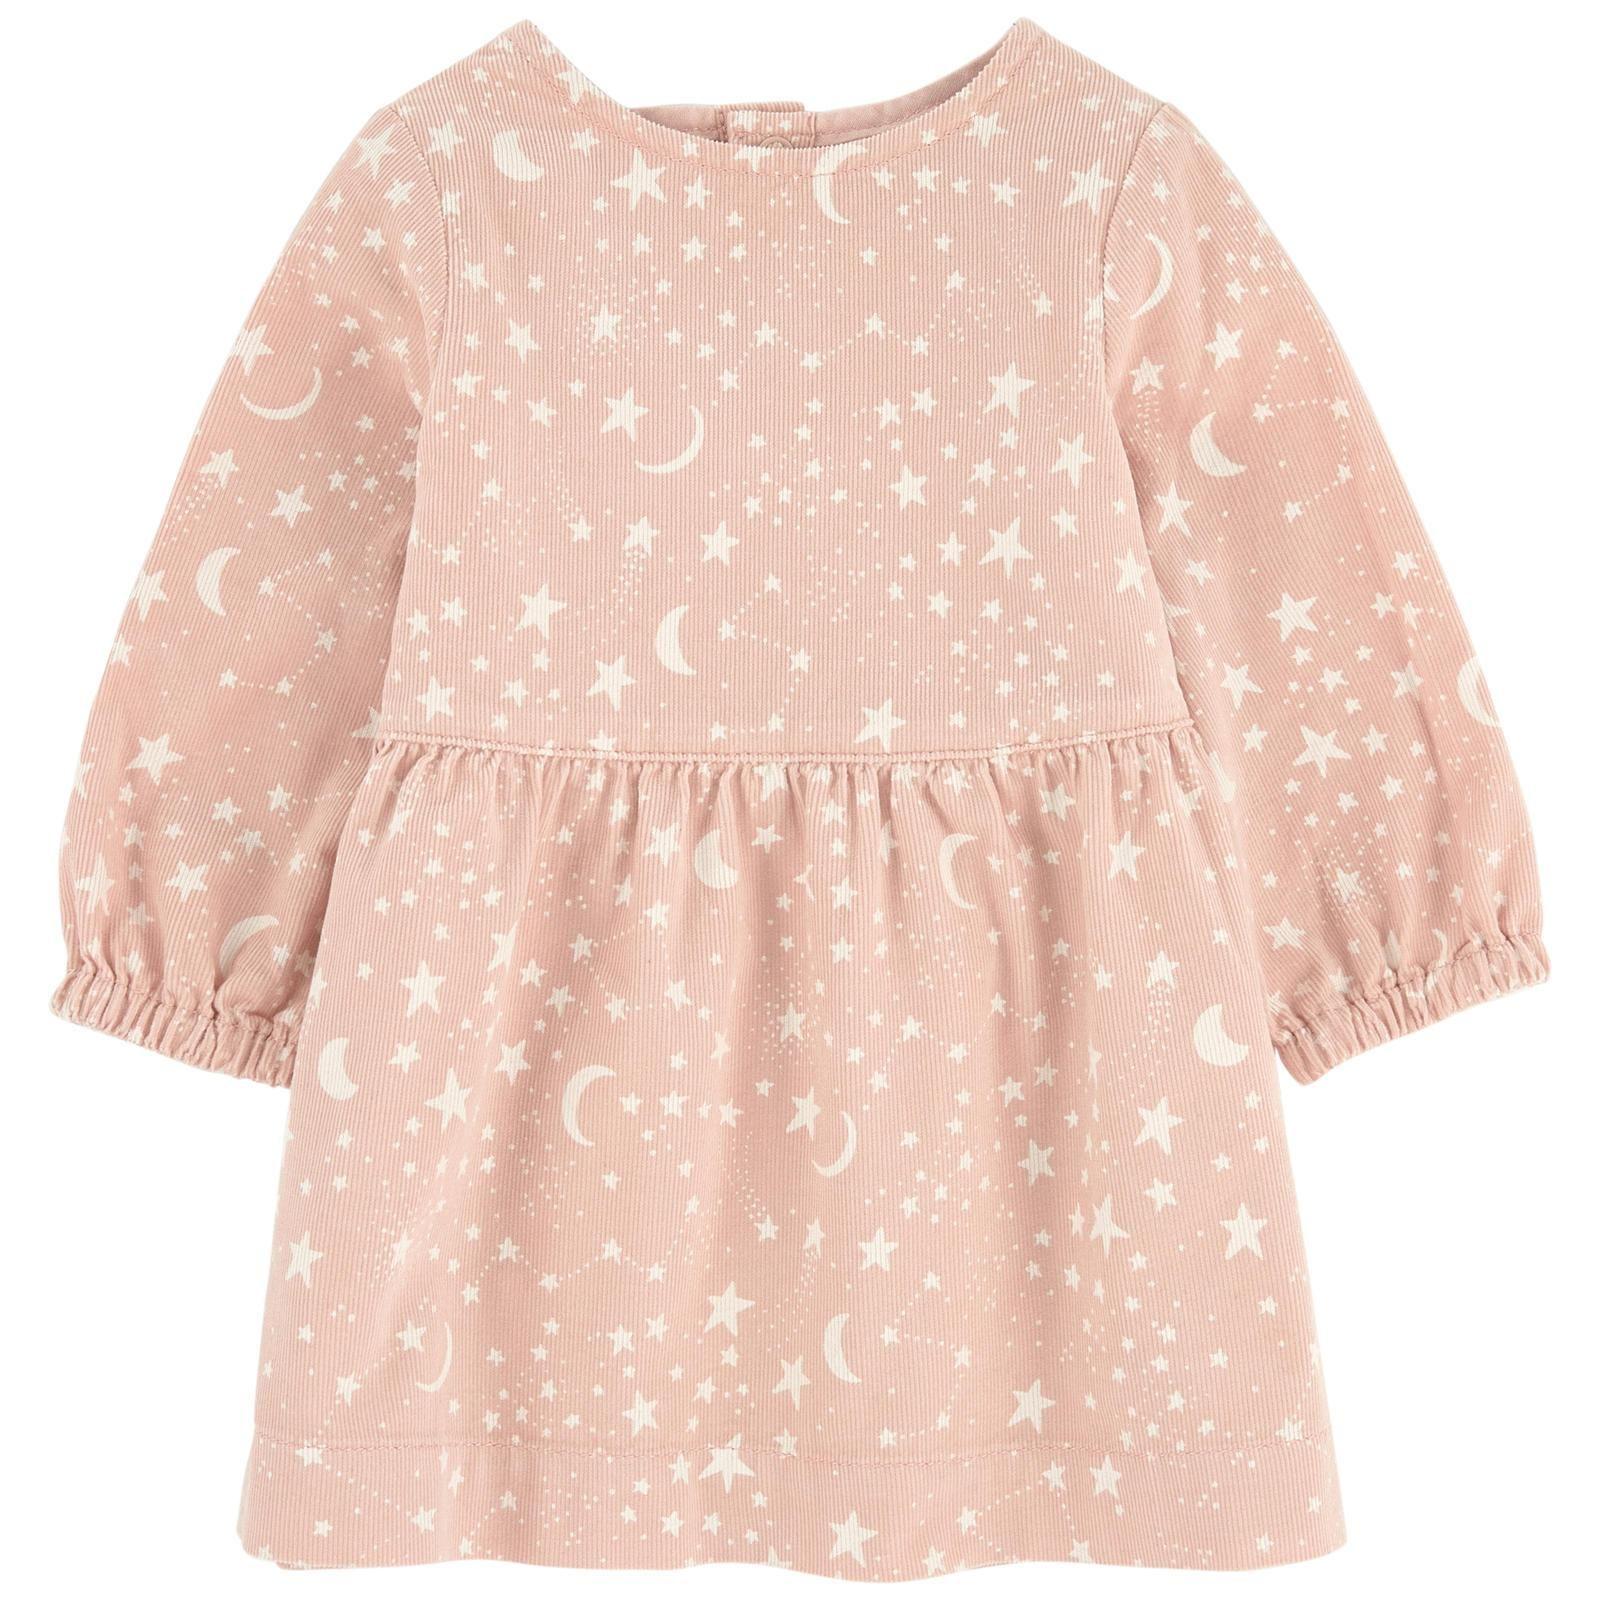 4997fb90491 Stella McCartney Kids Skippy Star And Moon Printed Corduroy Dress - Style  Number 471608 SJK51 - Stella McCartney